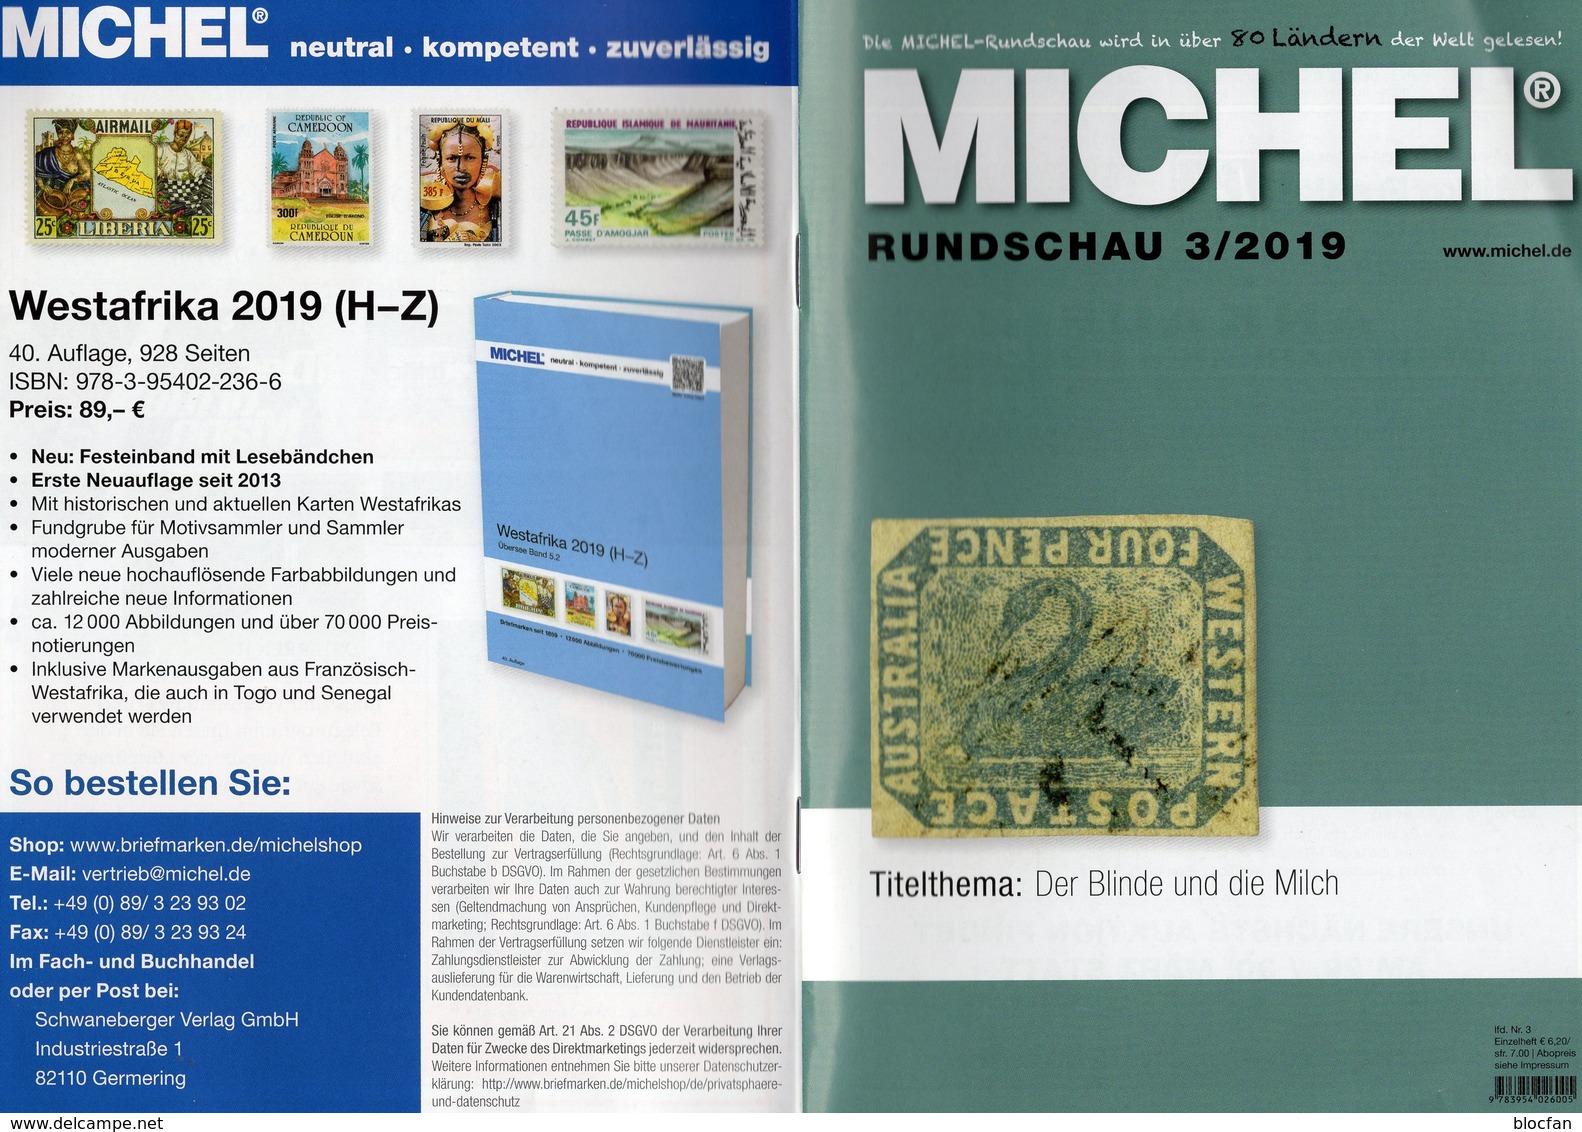 Rundschau MICHEL Briefmarken 3/2019 Neu 6€ Stamps Of The World Catalogue/magacine Of Germany ISBN 978-3-95402-600-5 - Encyclopédies